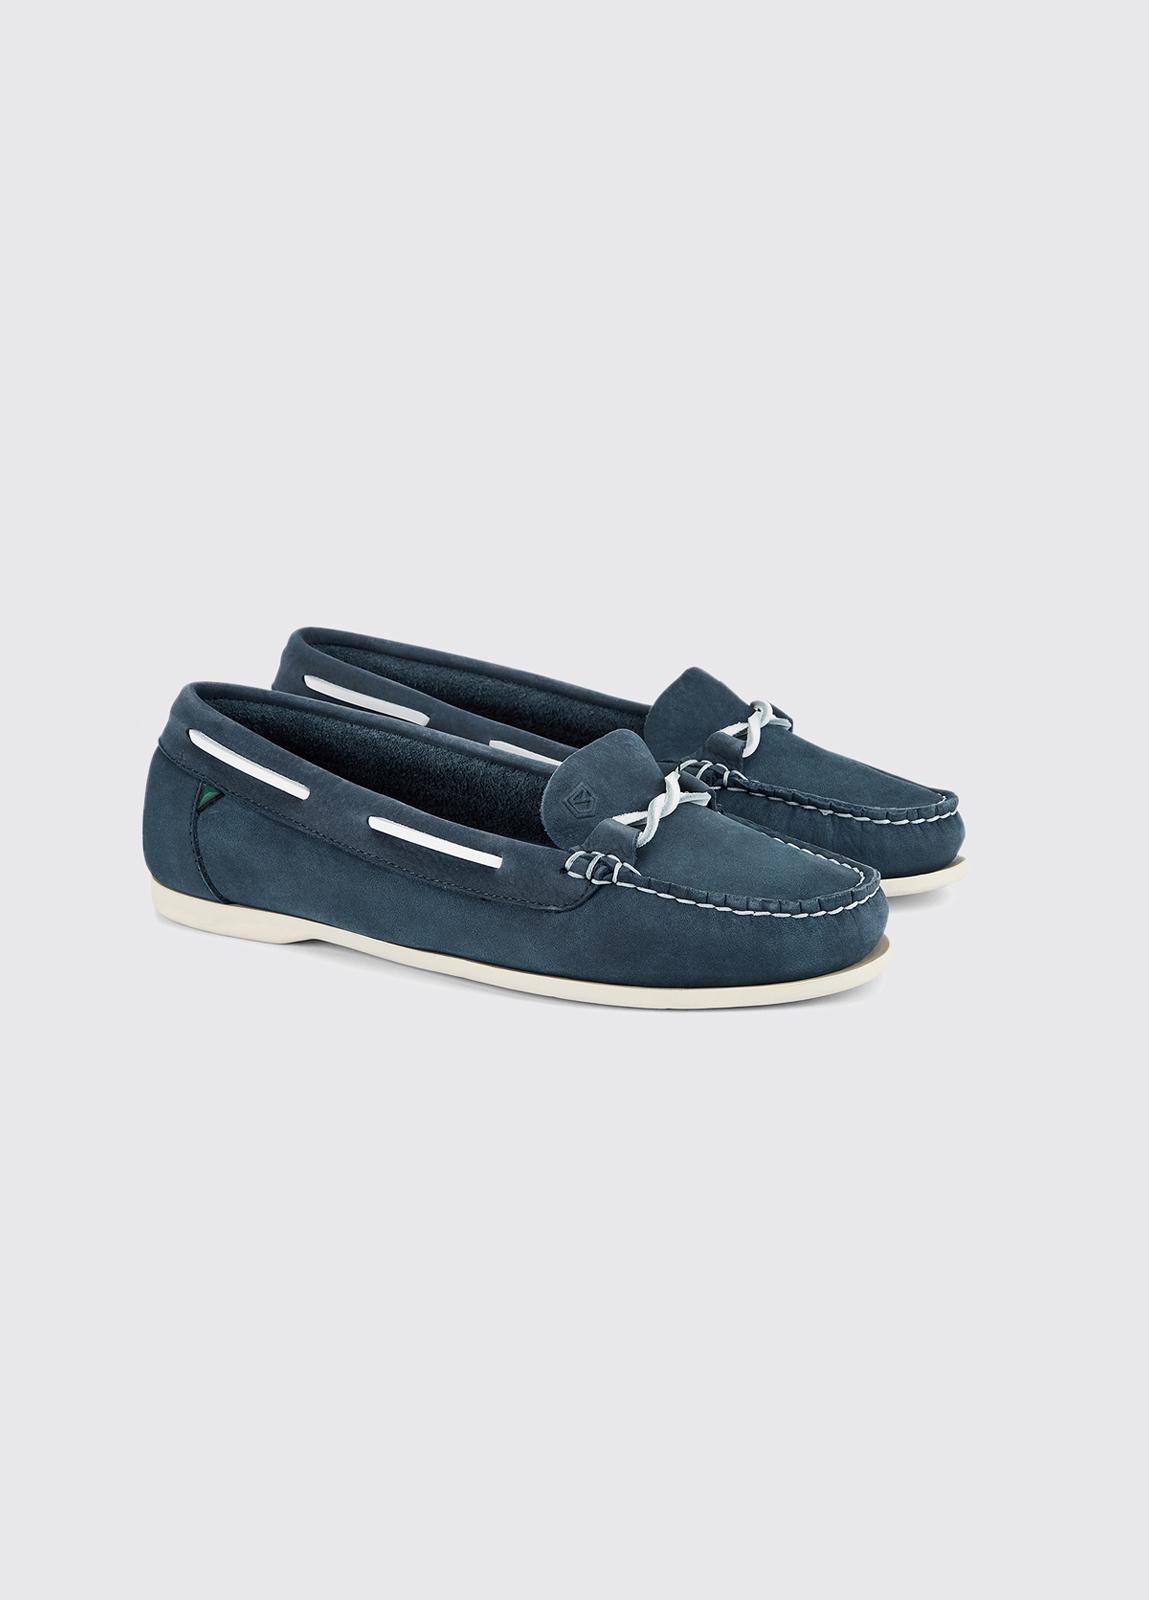 Rhodes Deck Shoe - Teal